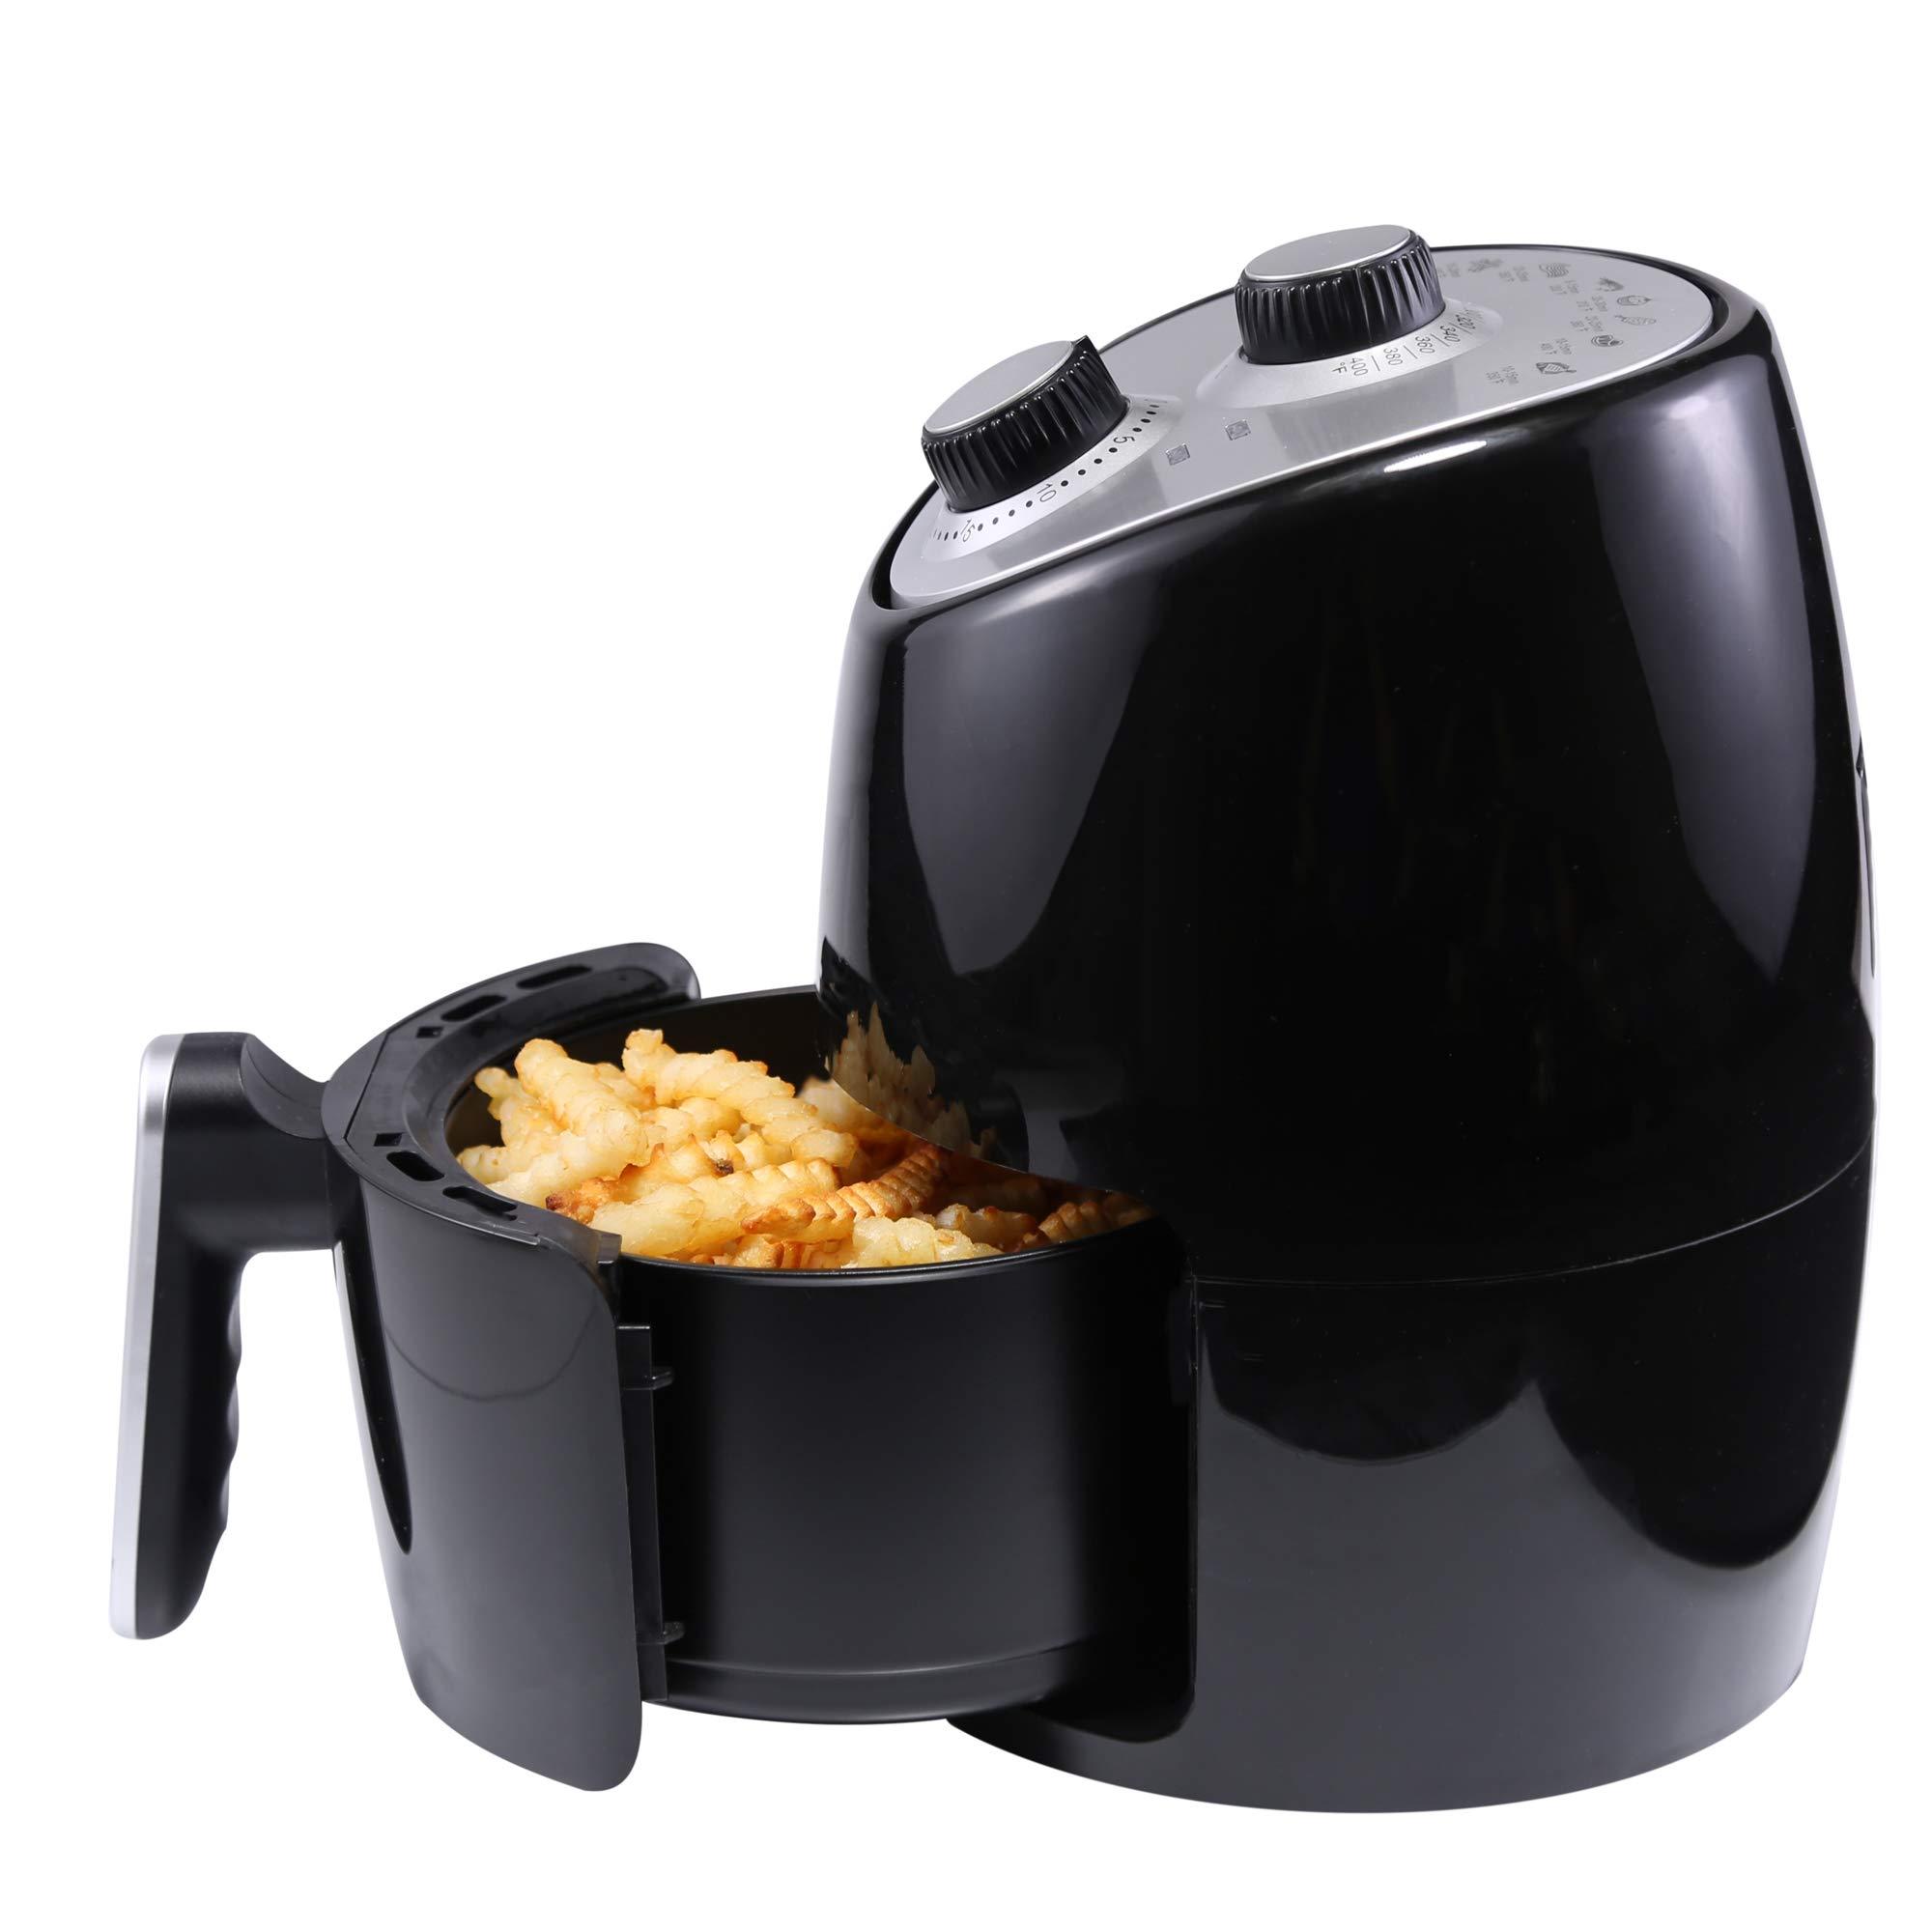 Continental Electric CE-DF309 Air Fryer 2.0 Liter, Black